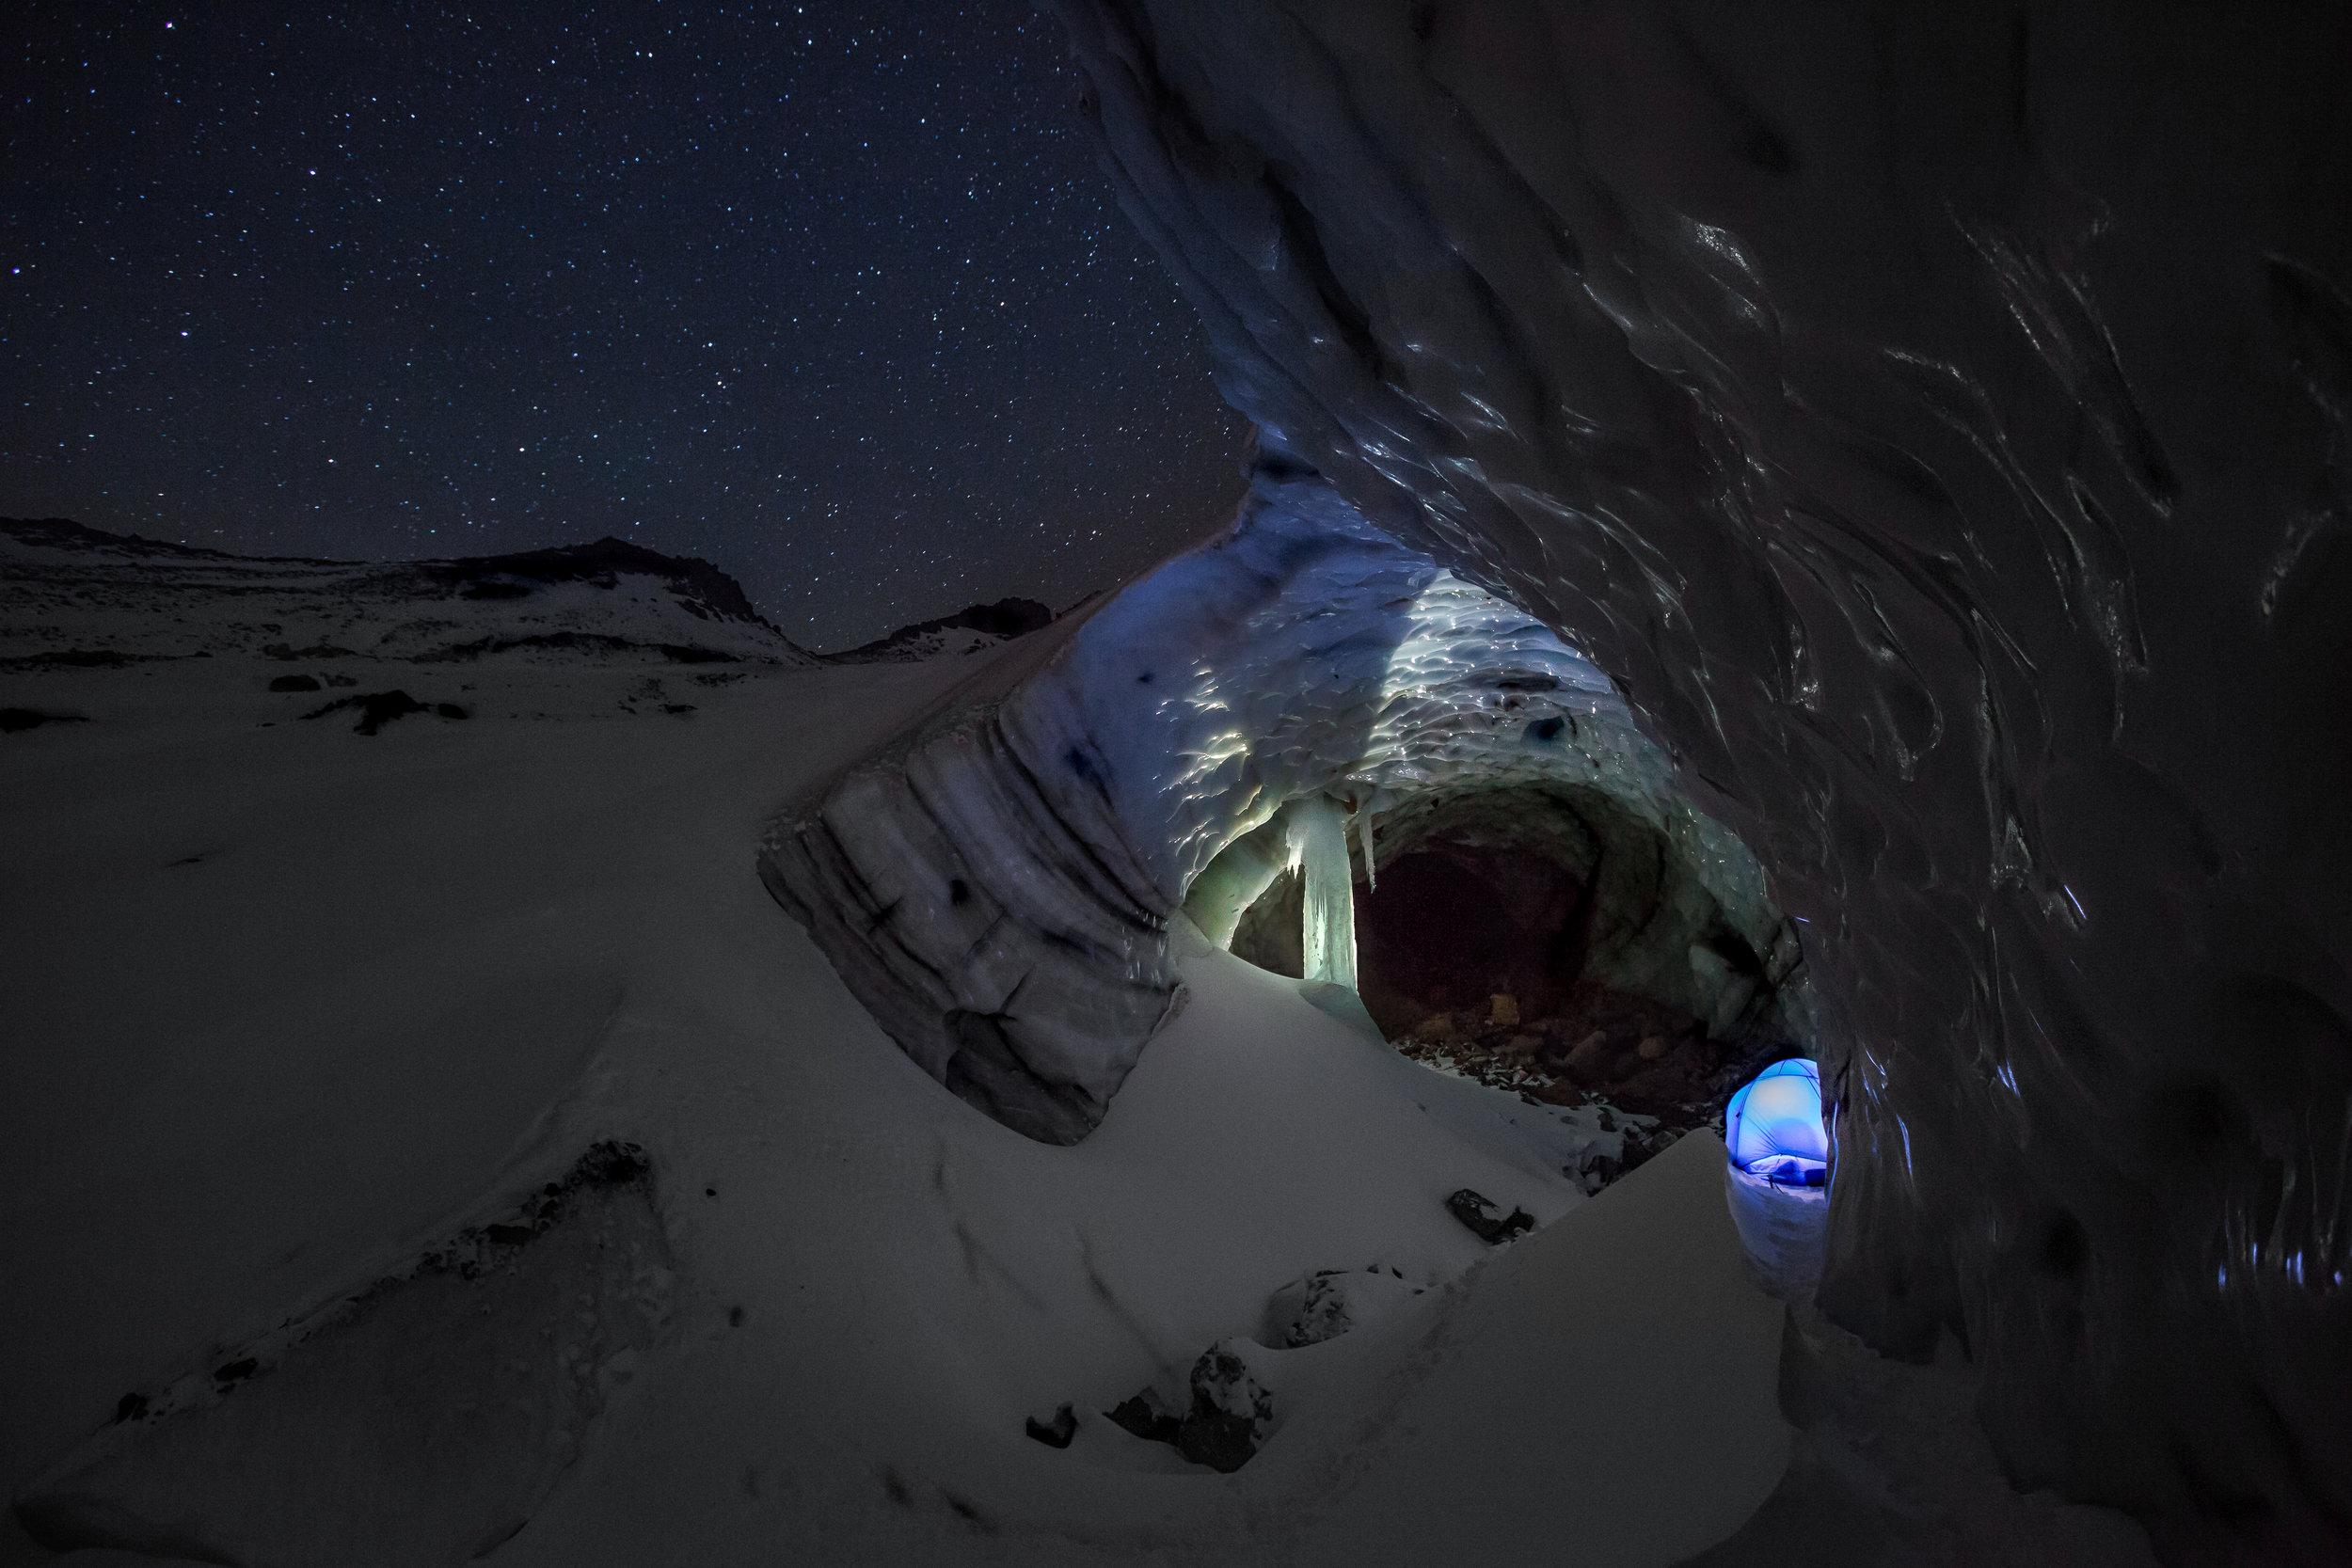 SG_6 snowdragon exterior glow tent-1.jpg